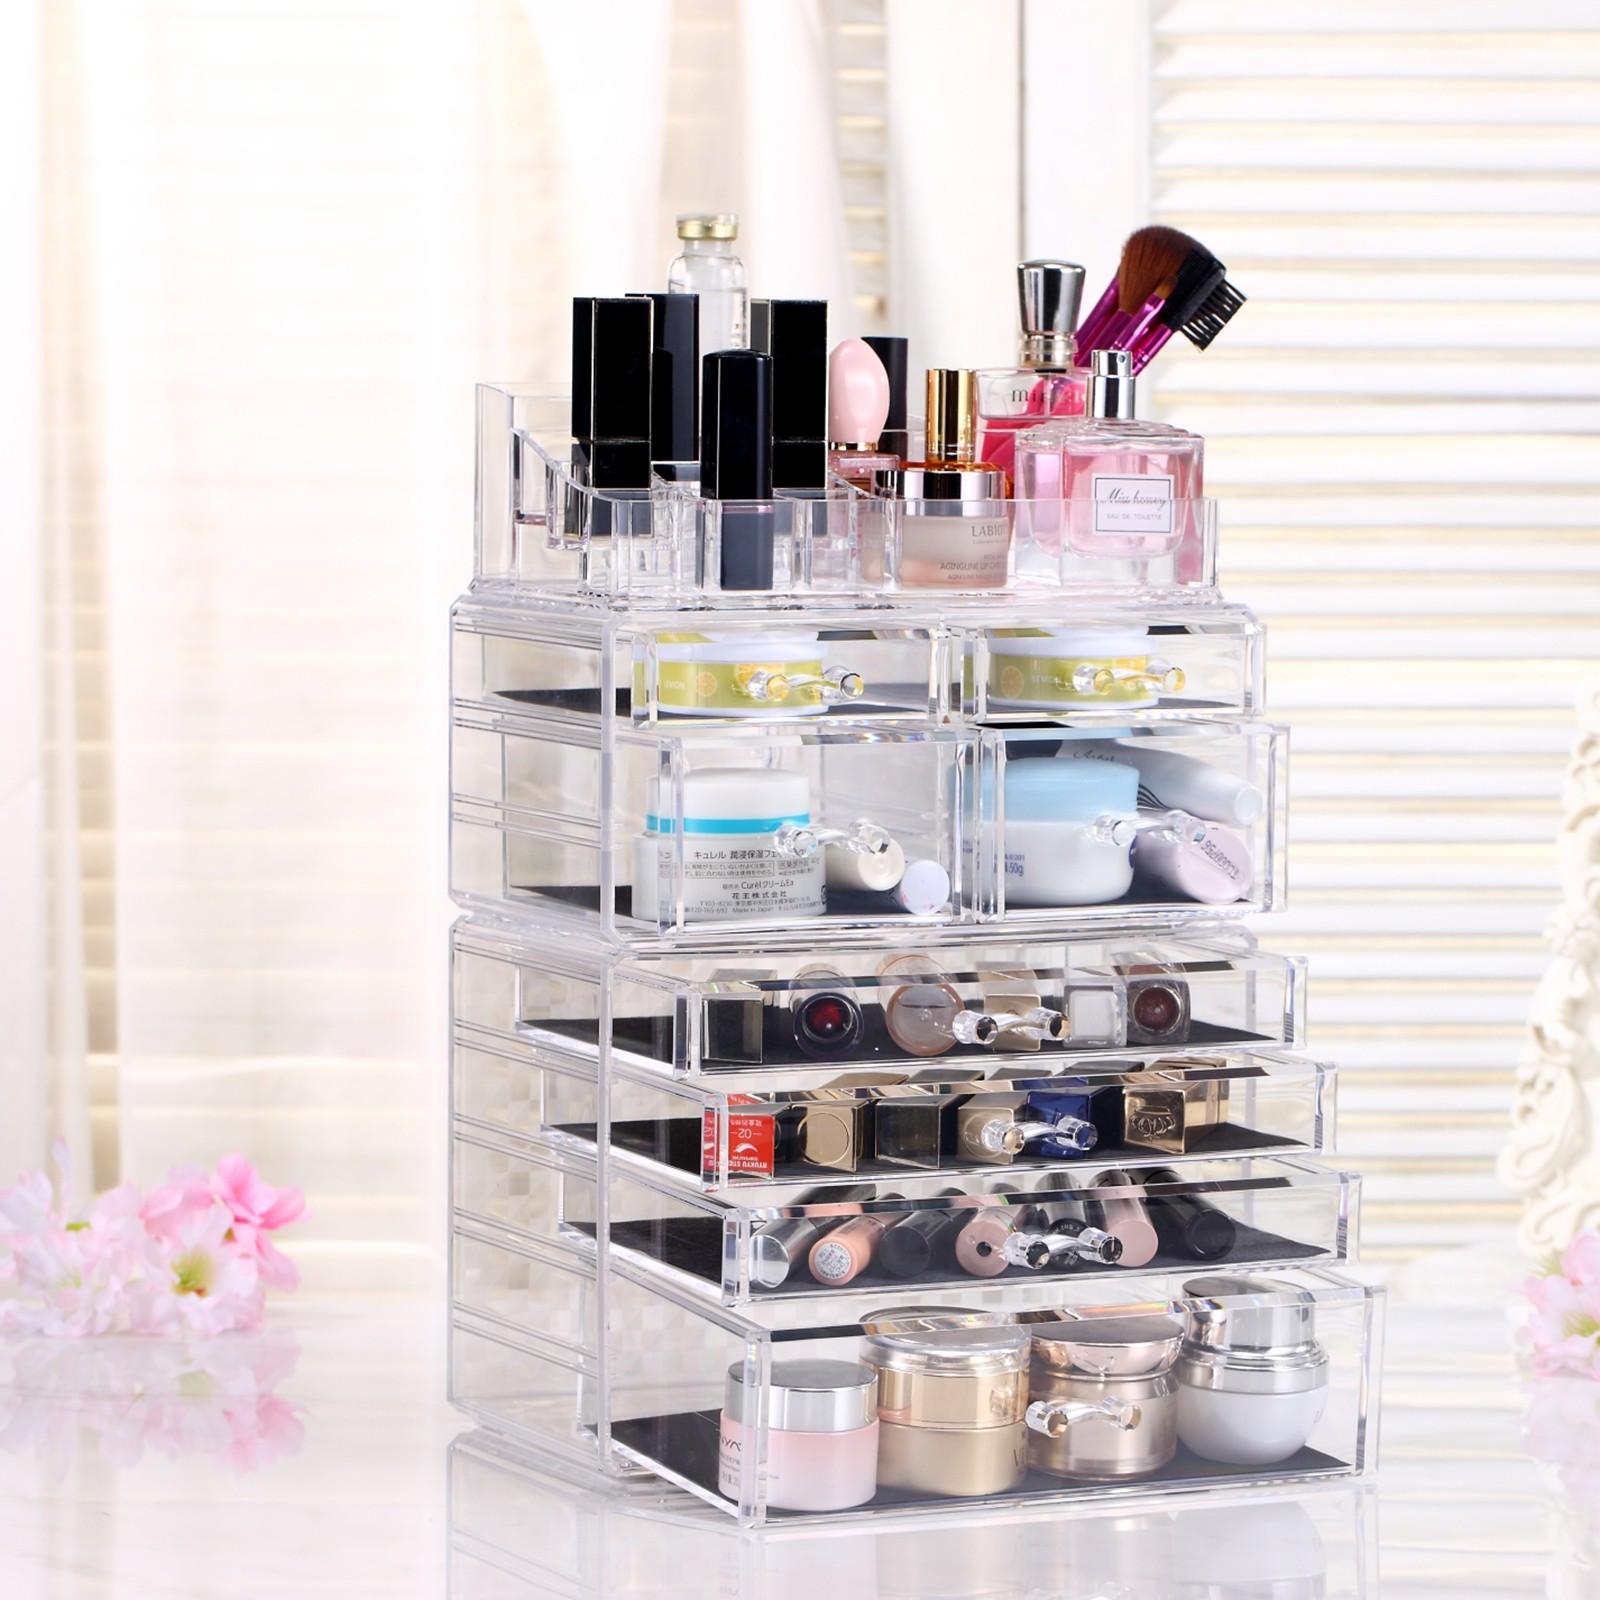 Kosmetik-B28-1